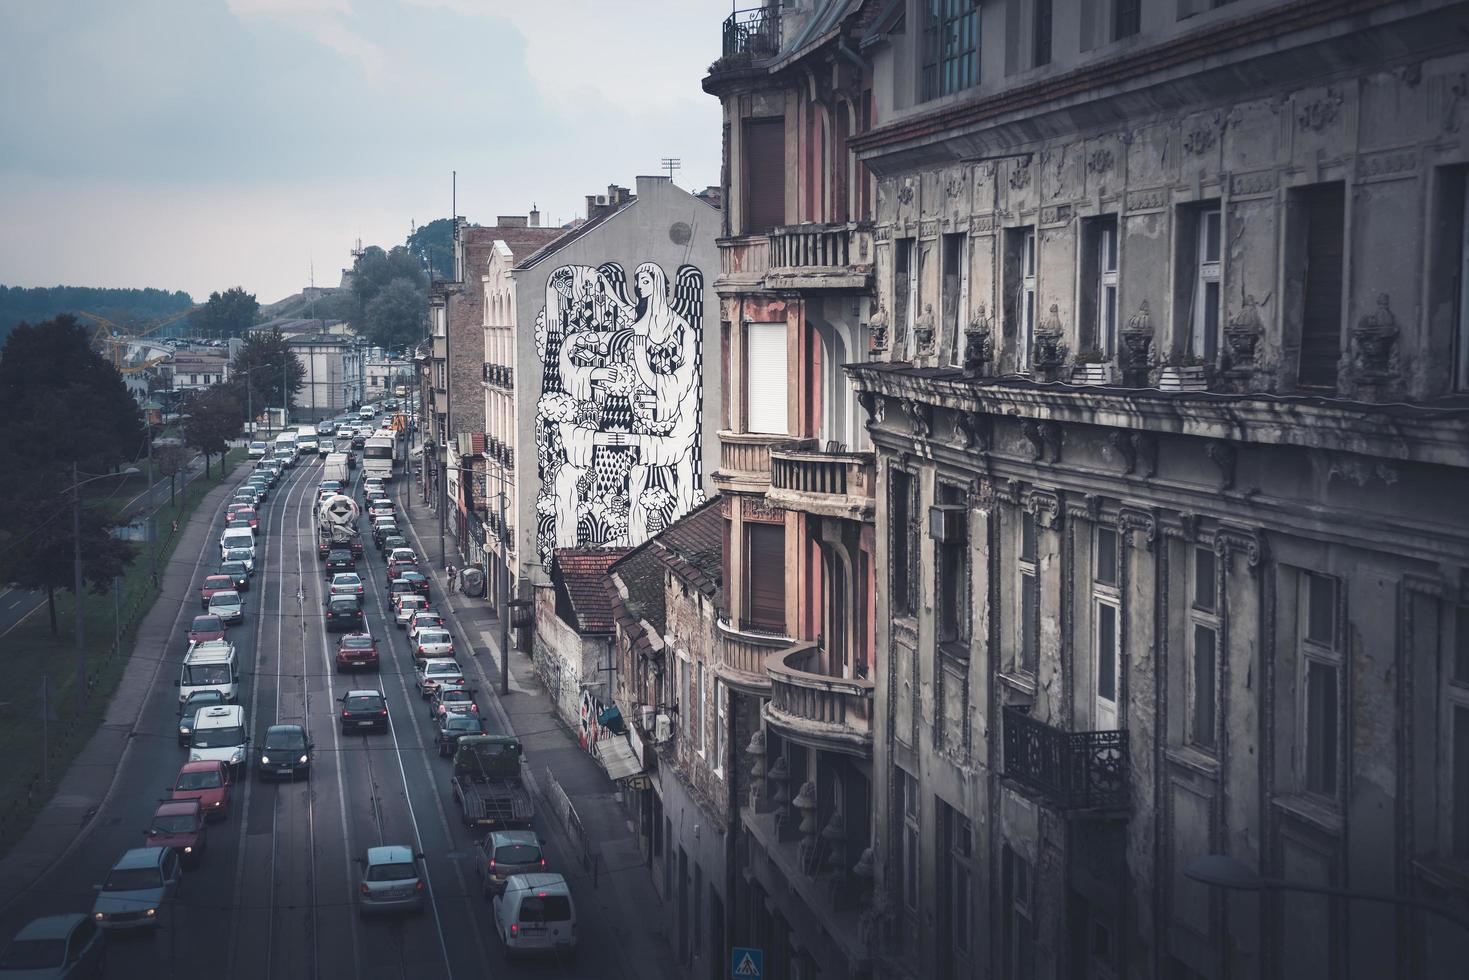 Belgrade, Serbie 2015 - rue Karadjordjeva et paysage urbain de Belgrade, vue depuis le pont de Brankov photo